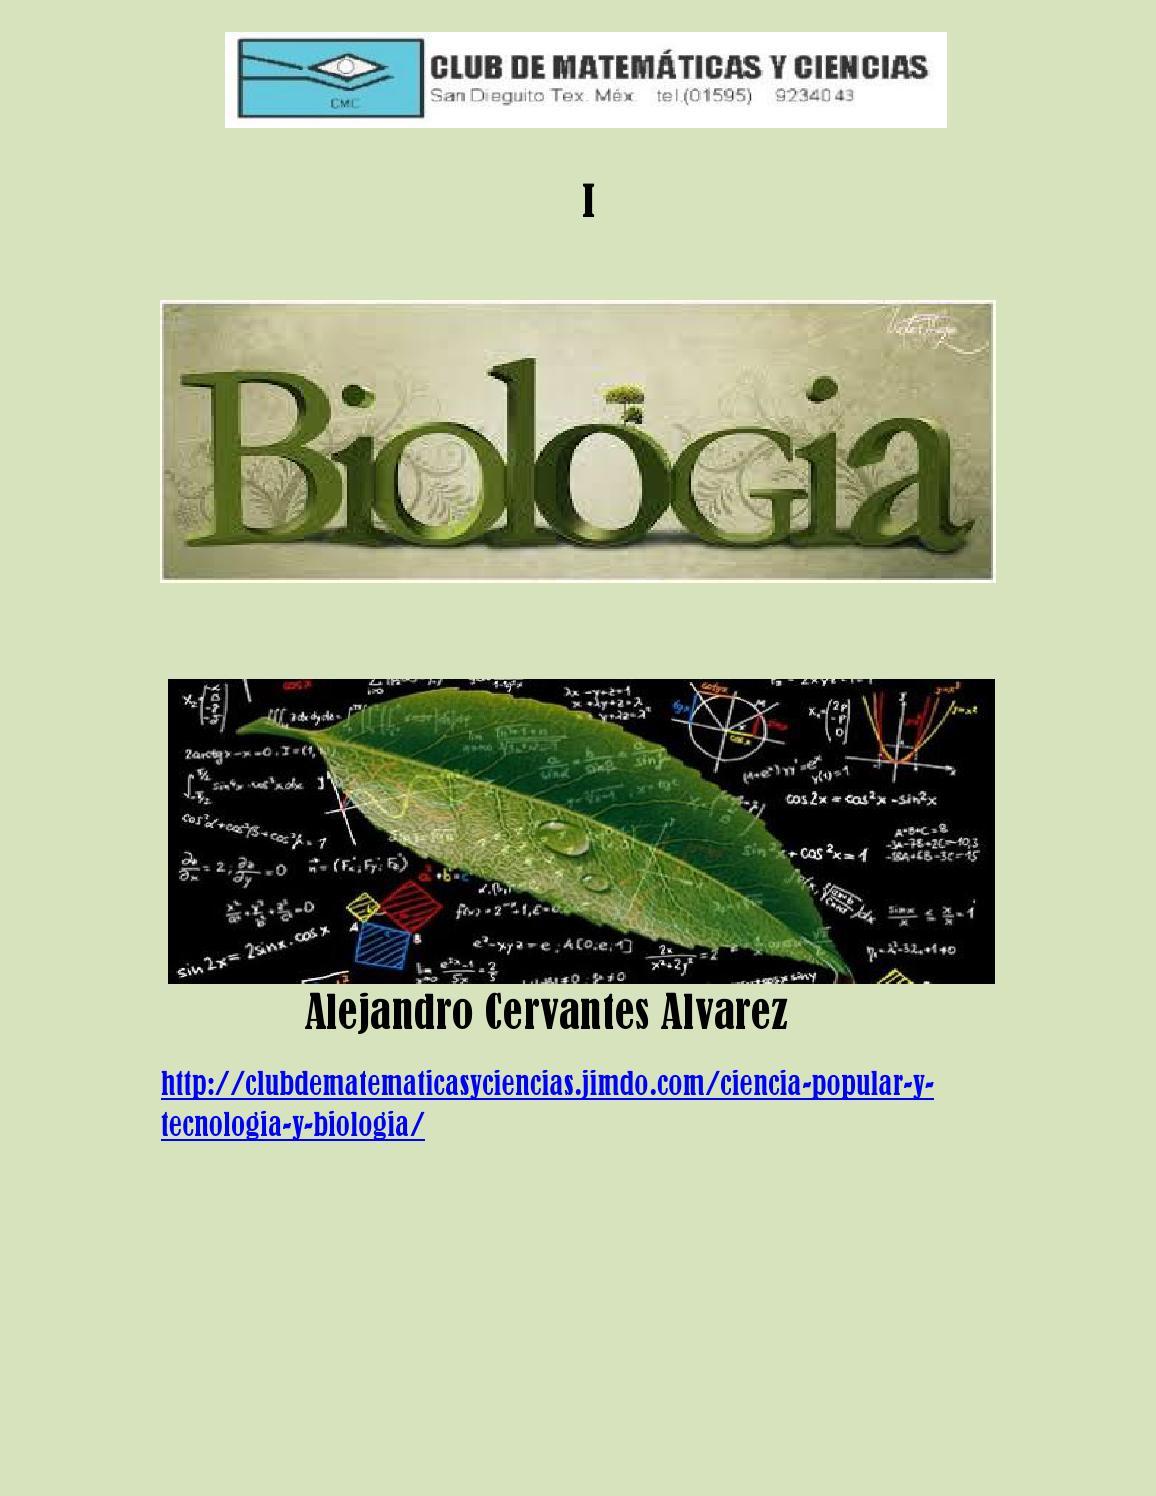 Biologia 1 by club de matemáticas y ciencias - issuu